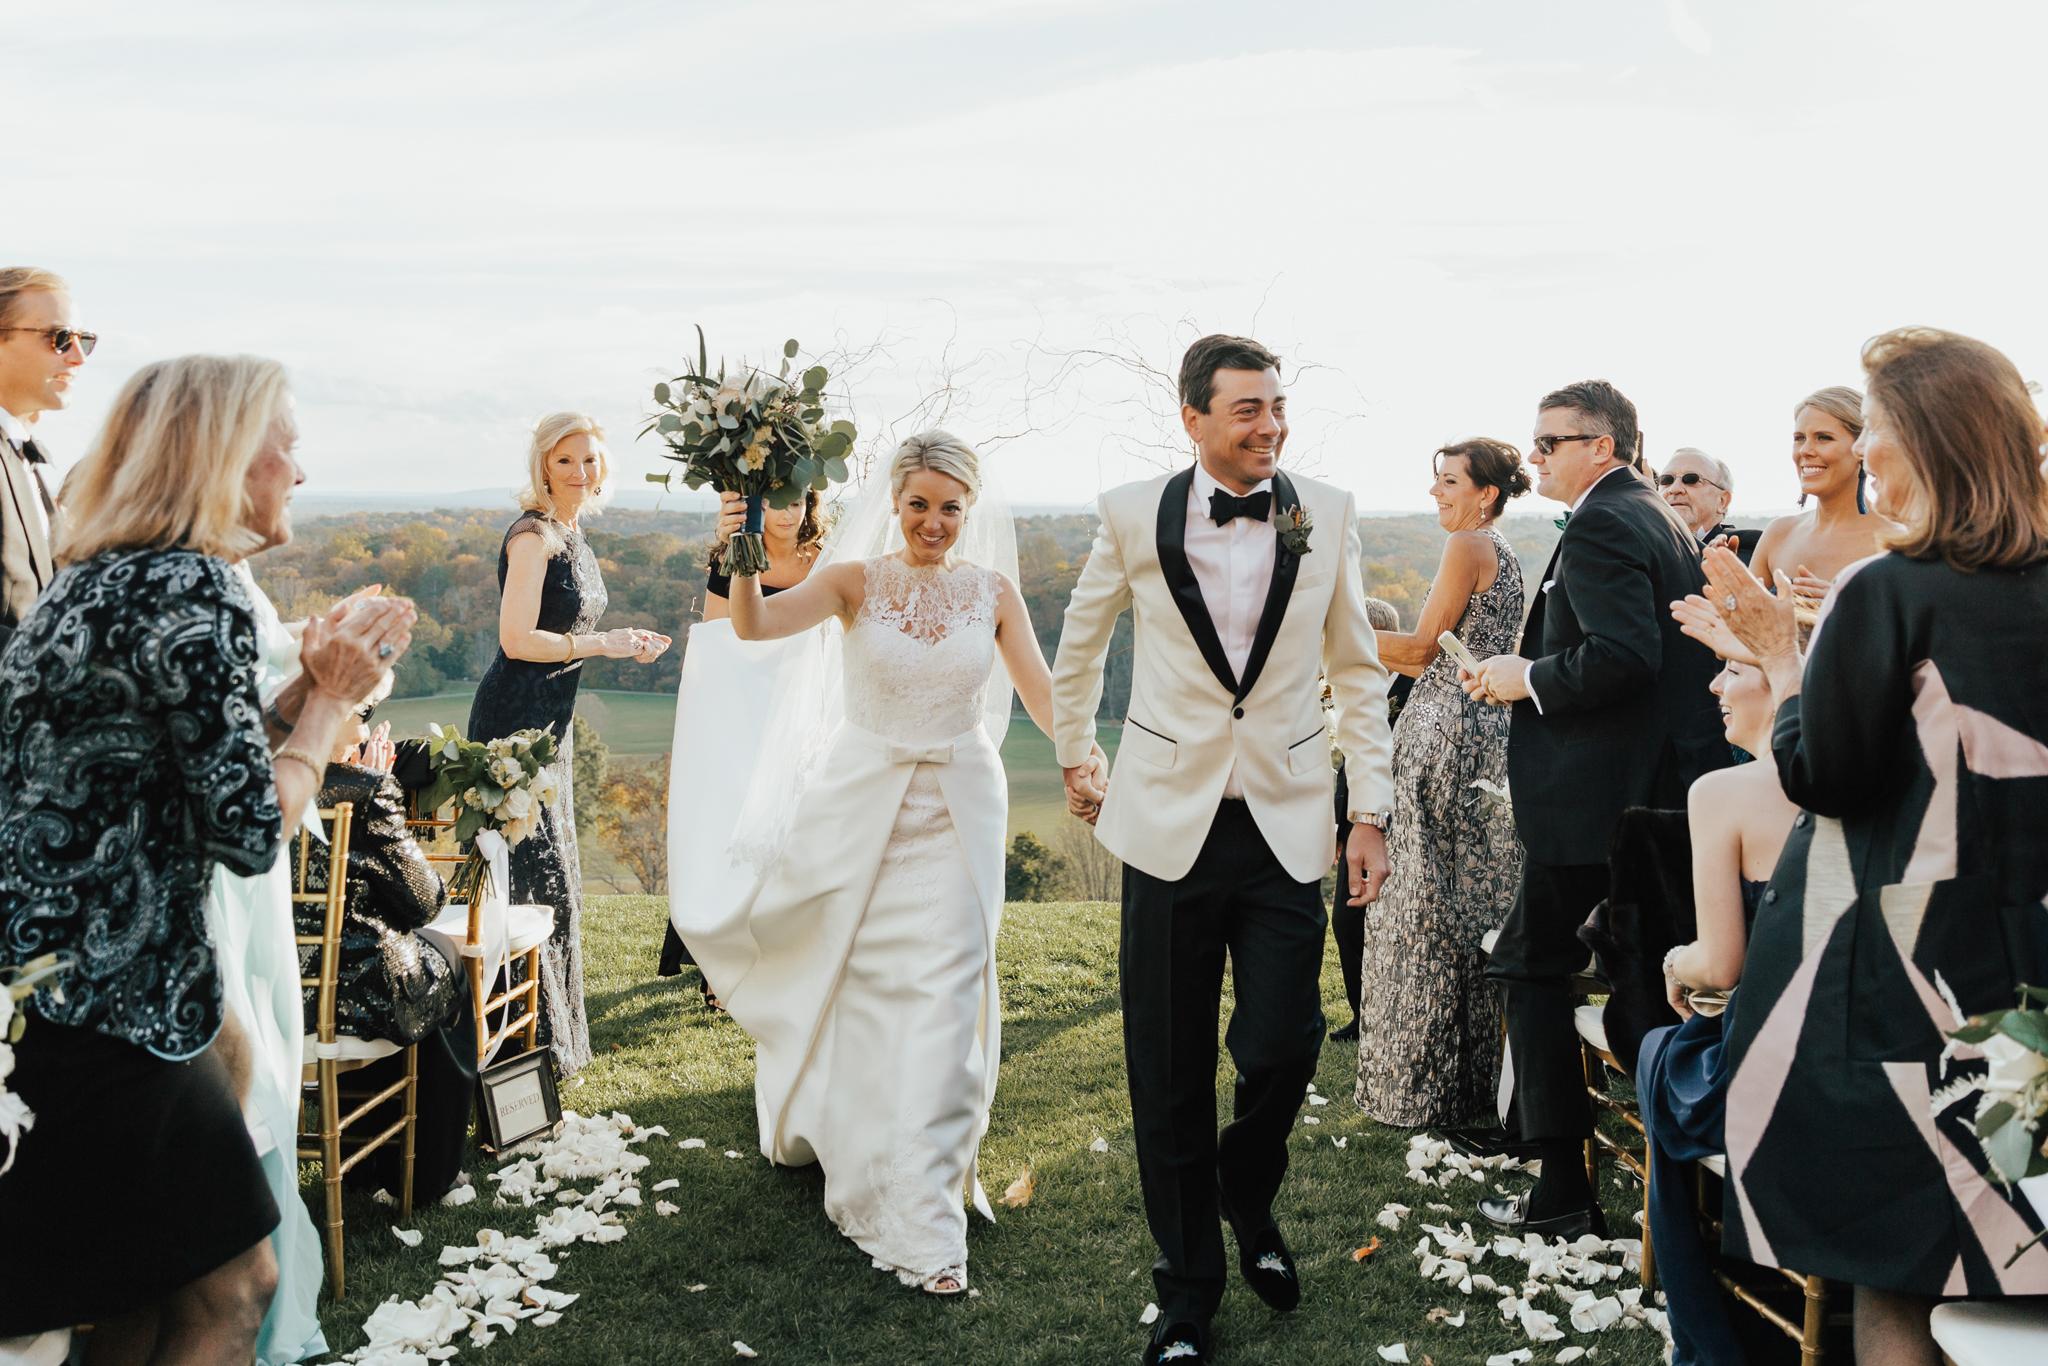 nyc creative wedding photographer